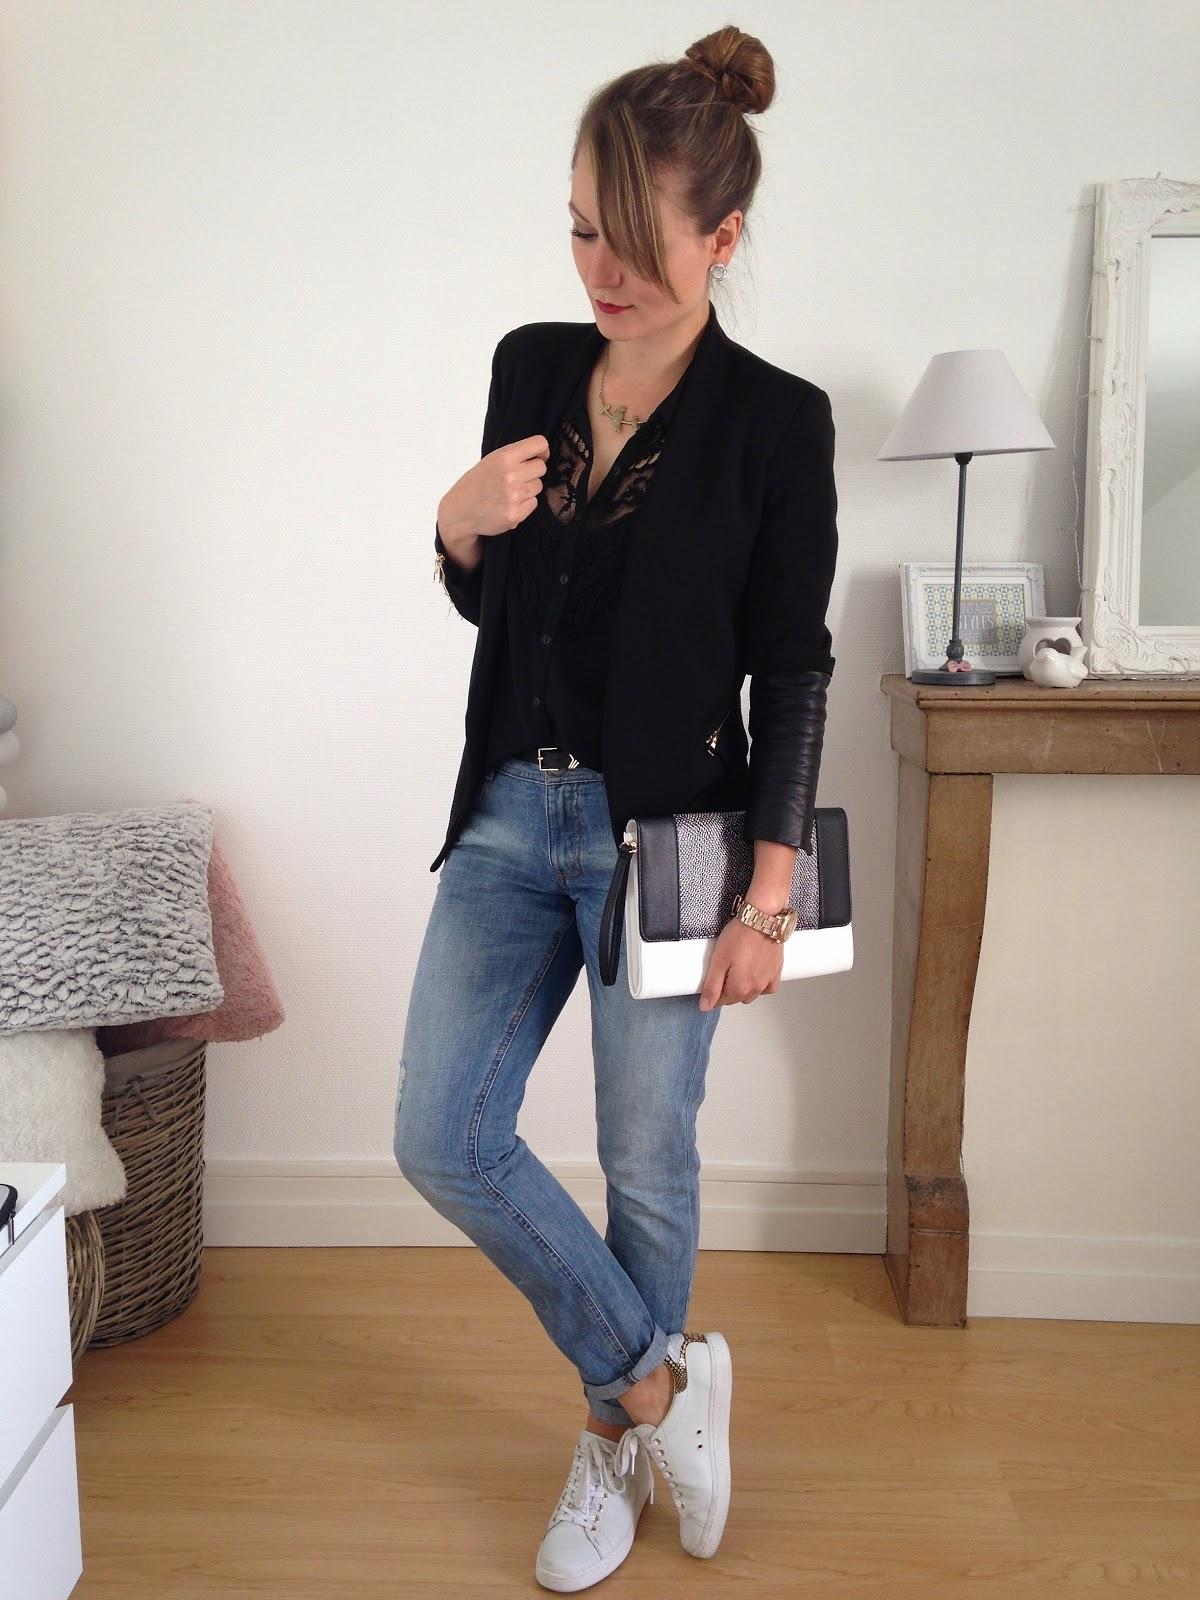 confortable boyfriend pauline dress blog mode lifestyle et d co besan on. Black Bedroom Furniture Sets. Home Design Ideas